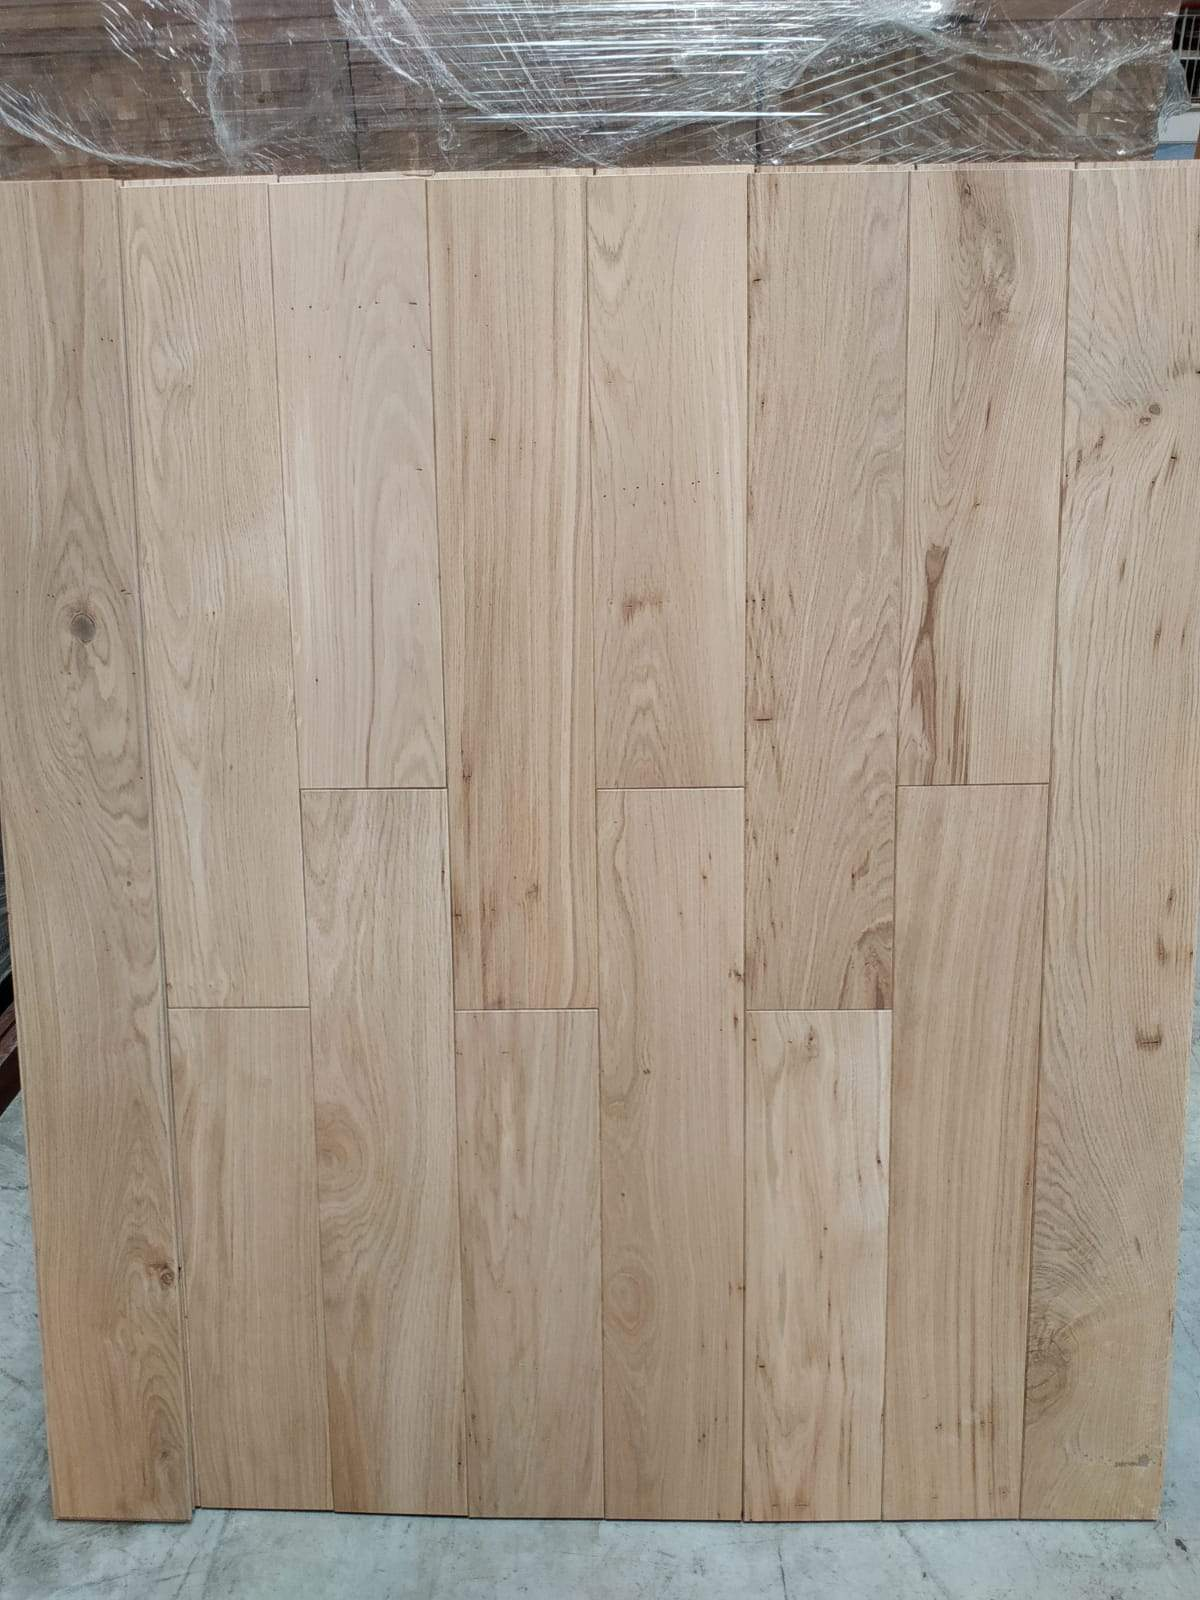 parquet chene massif 15x130mmm huile invisible aspect bois brut